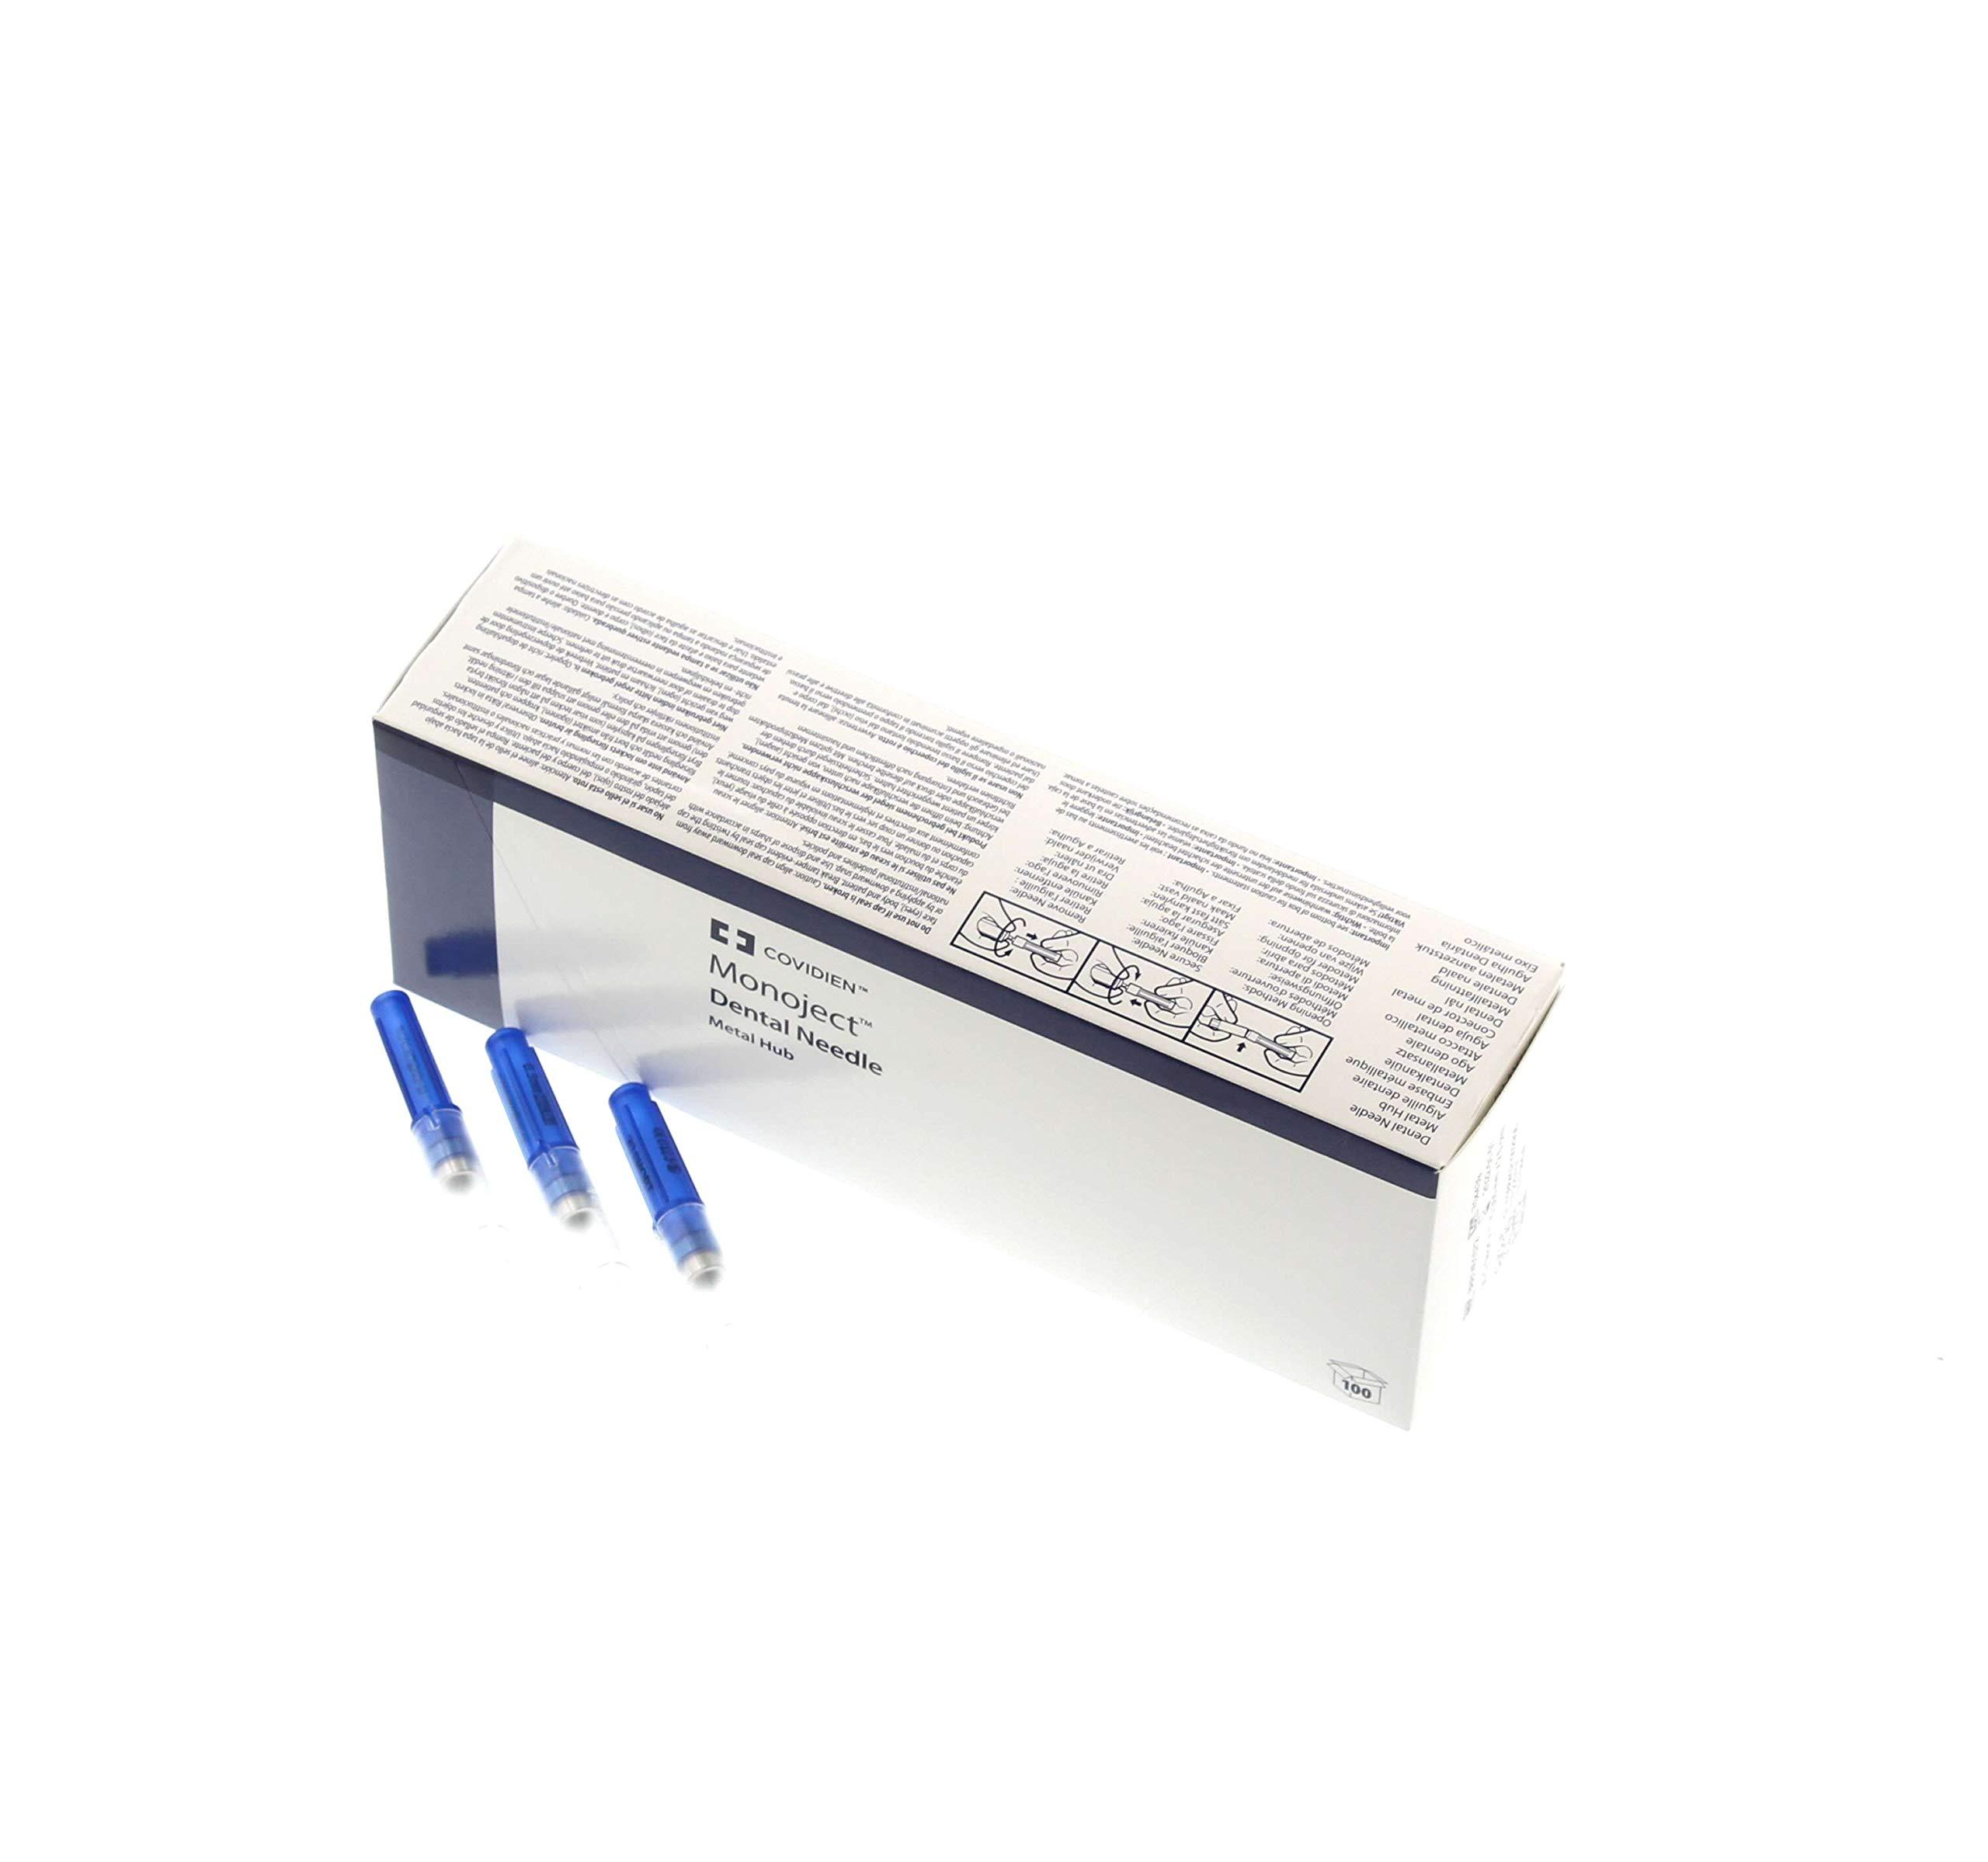 Monoject 401 Metal Hub Disposable, Color-Coded Needles, 100/Box